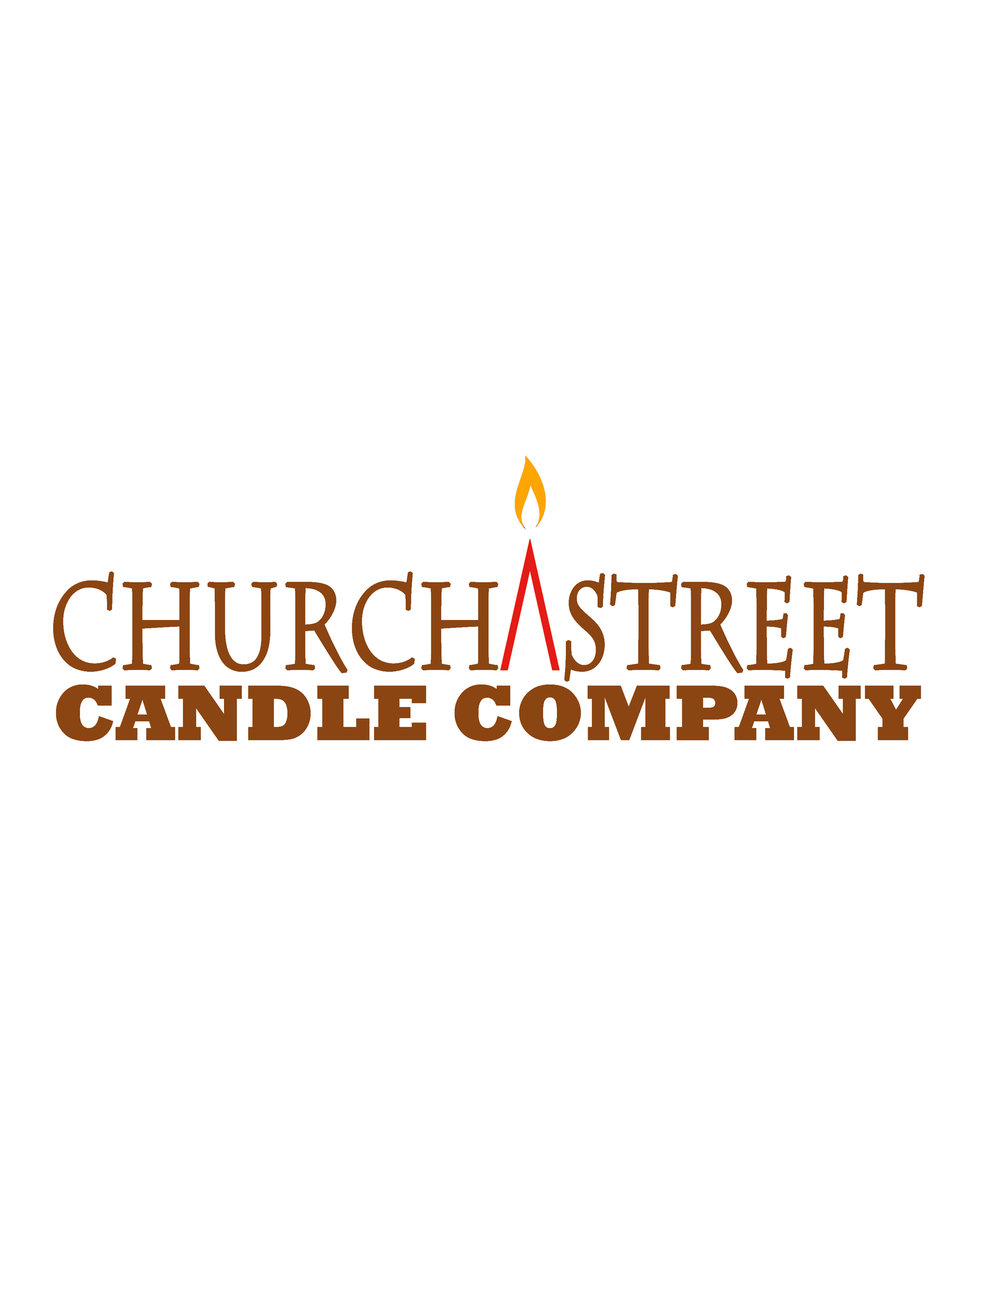 Church Street Candle Company Logo Official.jpg